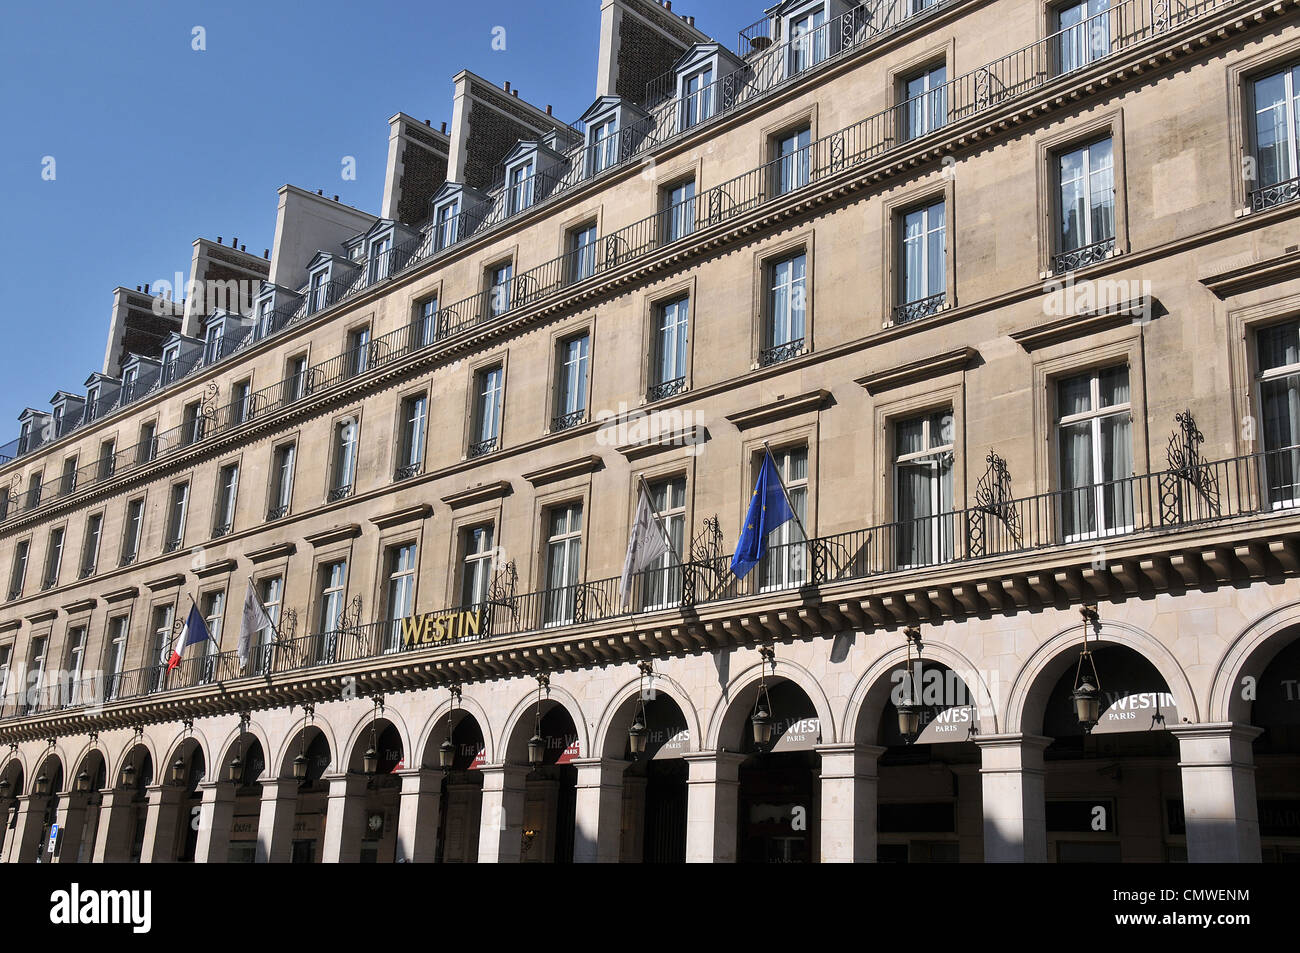 The Westin Paris Hotel Paris France Stock Photo 47274240